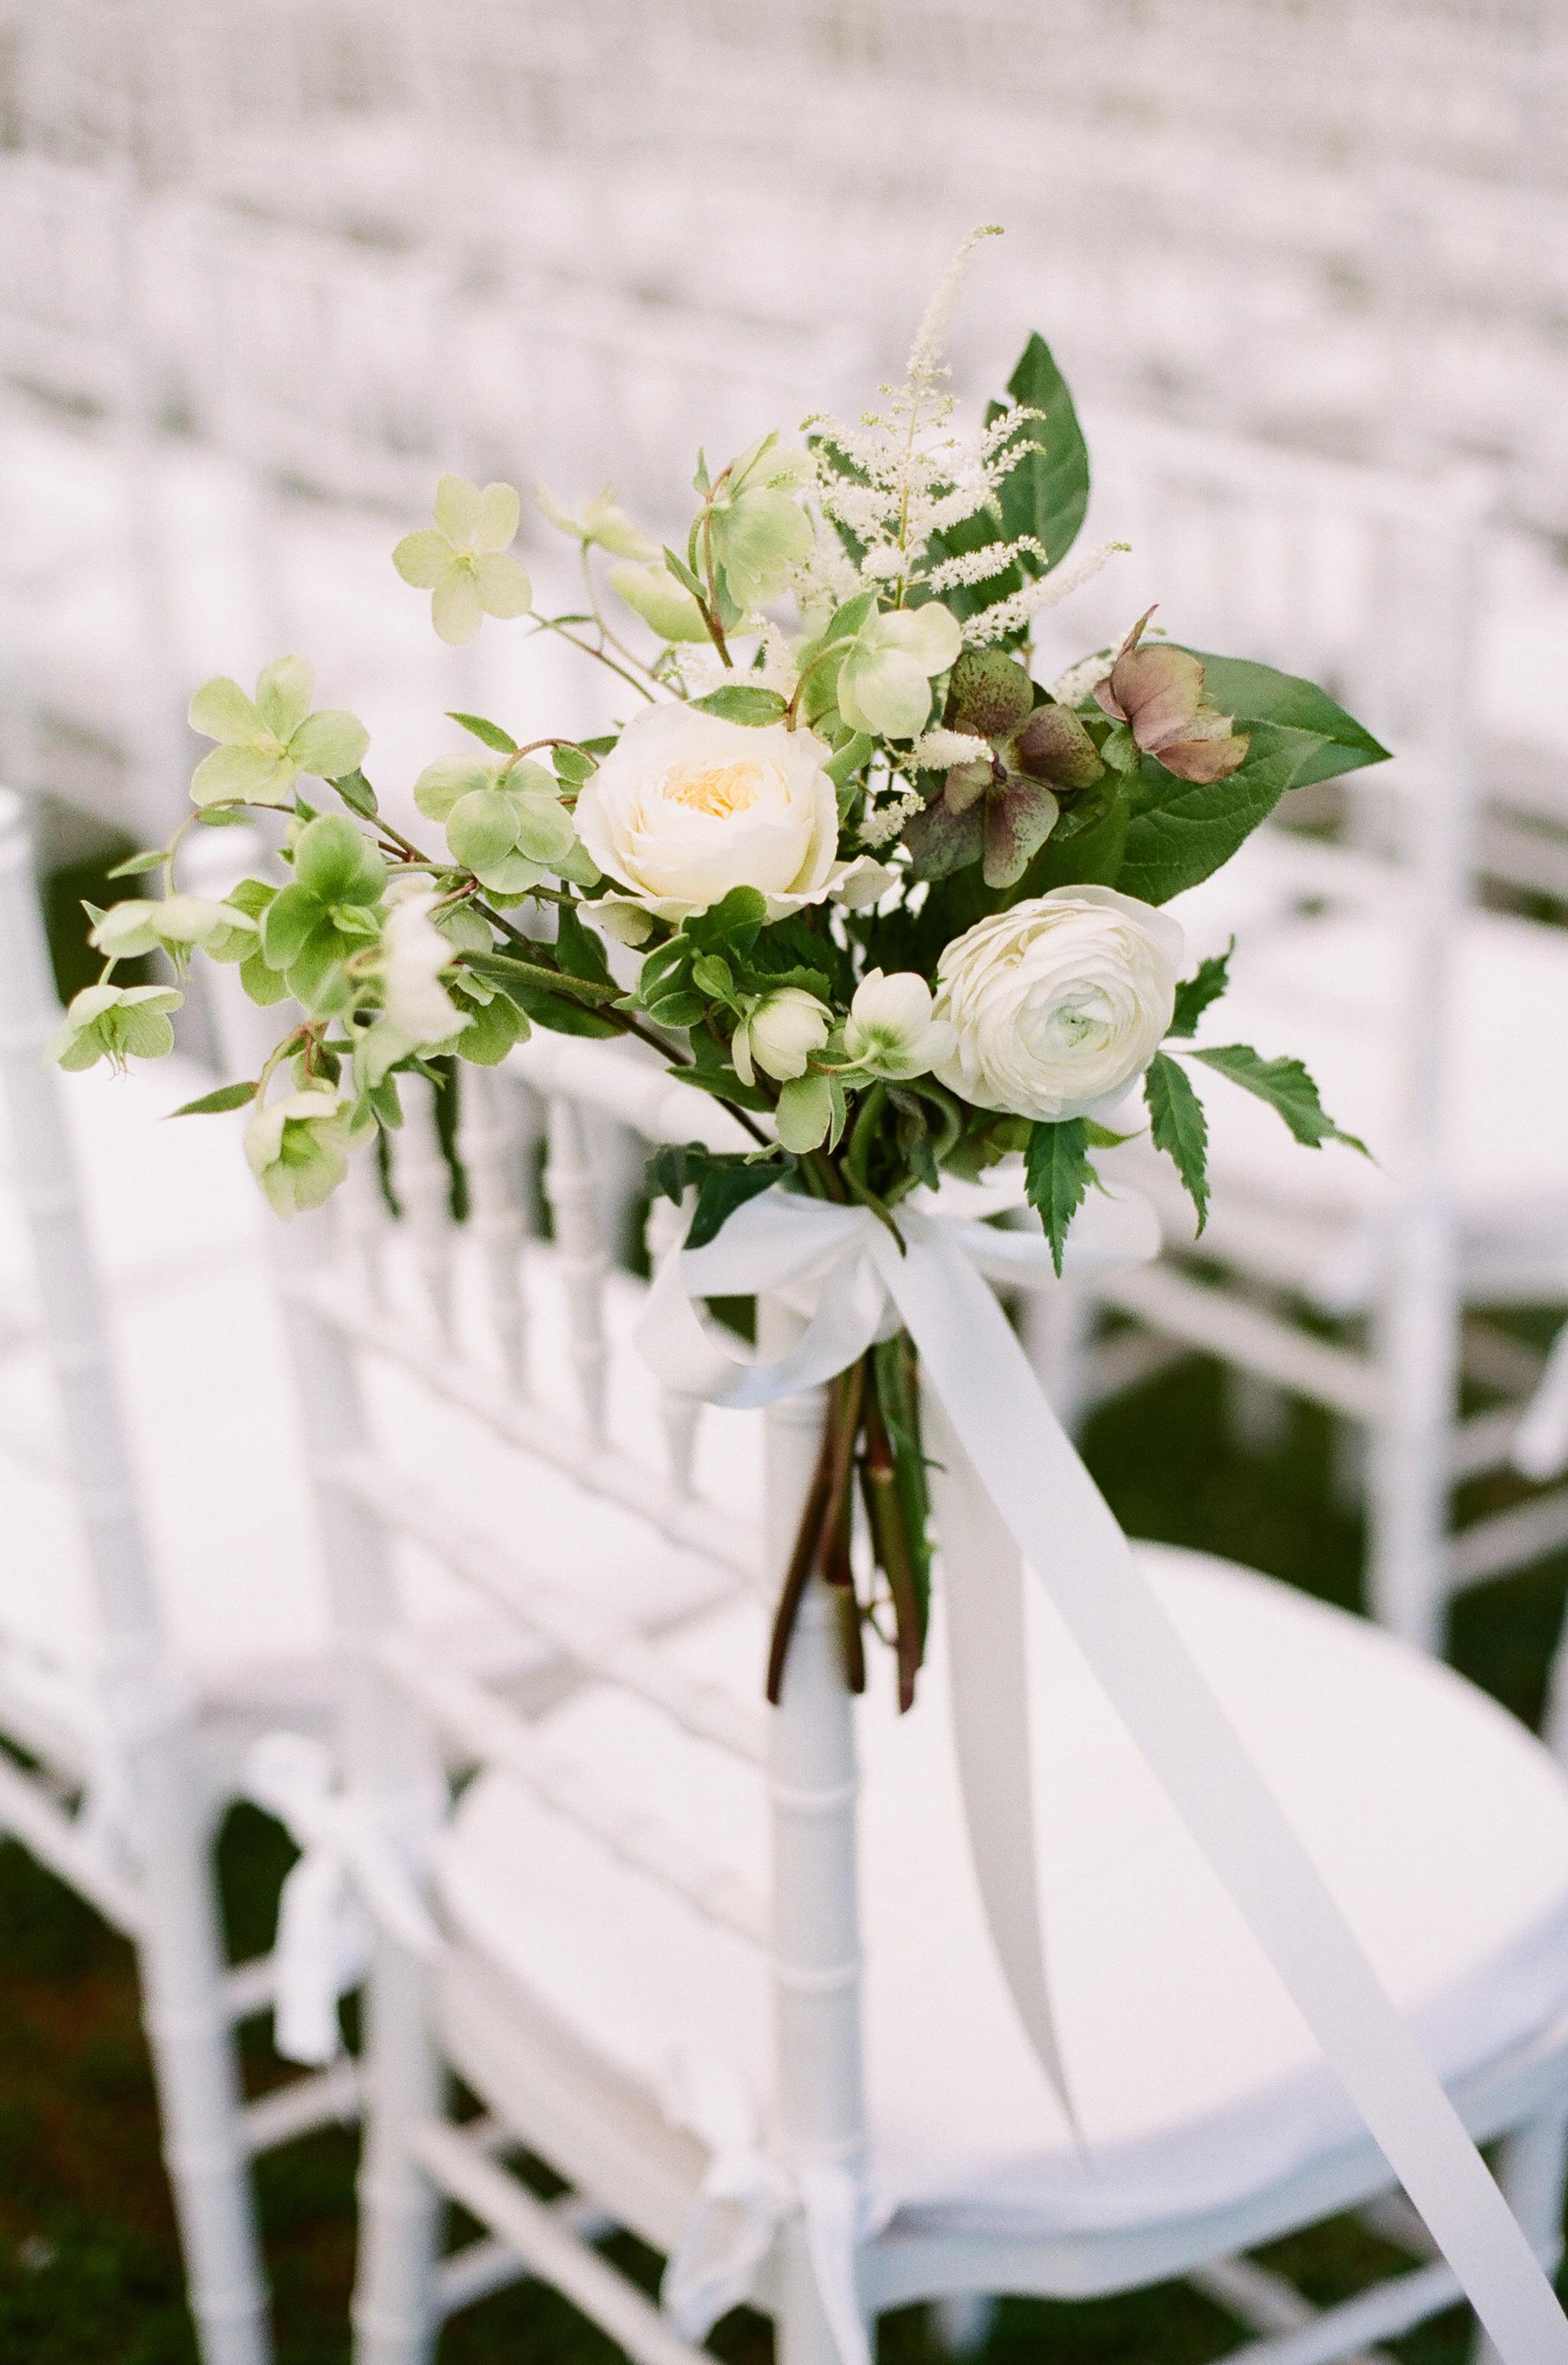 pew-marker-wedding-ceremony-greg-boulus-events-augusta-georgia